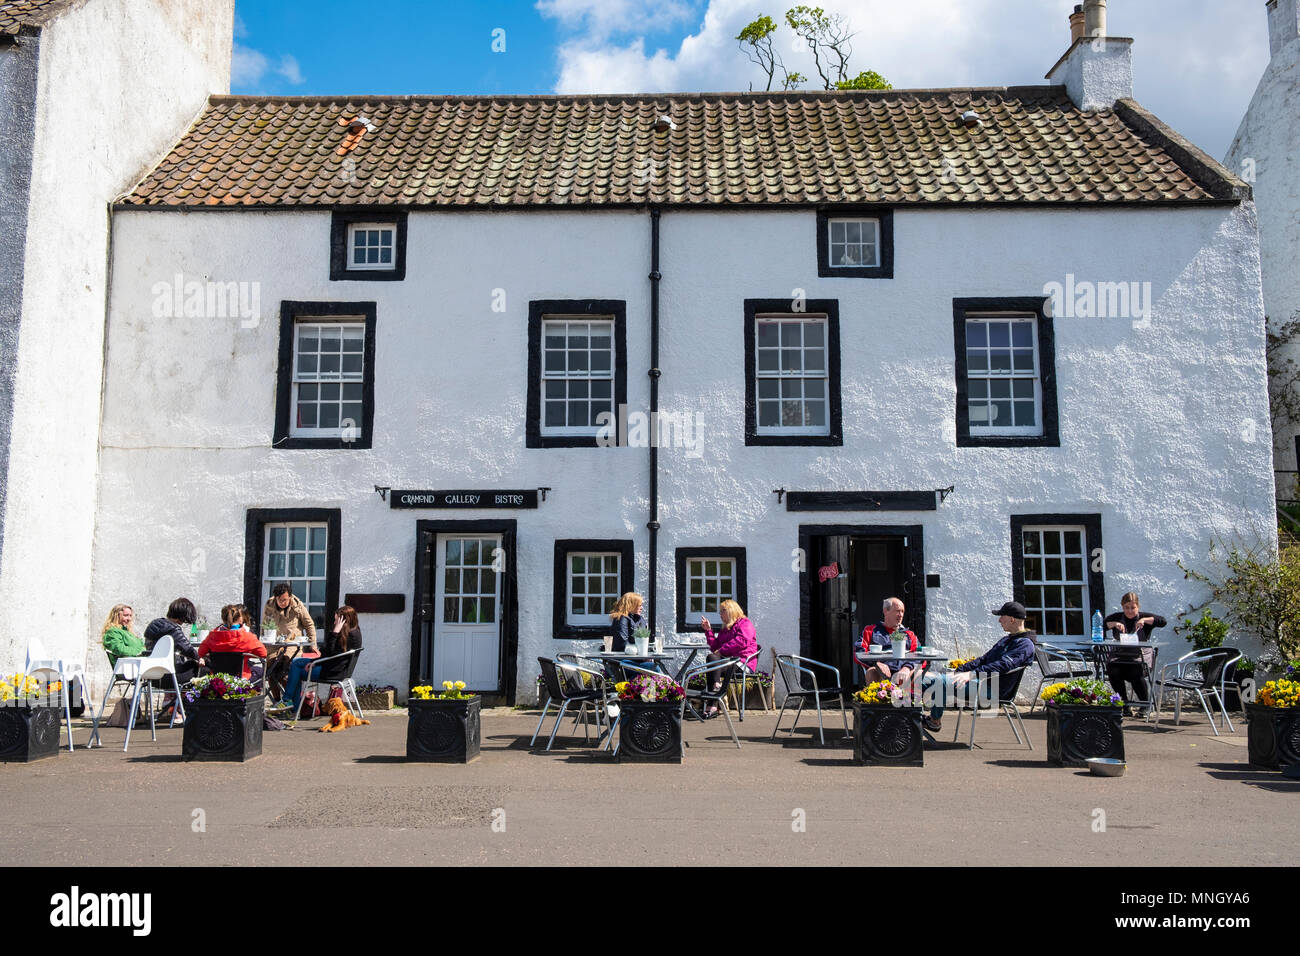 Cramond Gallery Bistro in village of Cramond outside Edinburgh, Scotland, UK - Stock Image